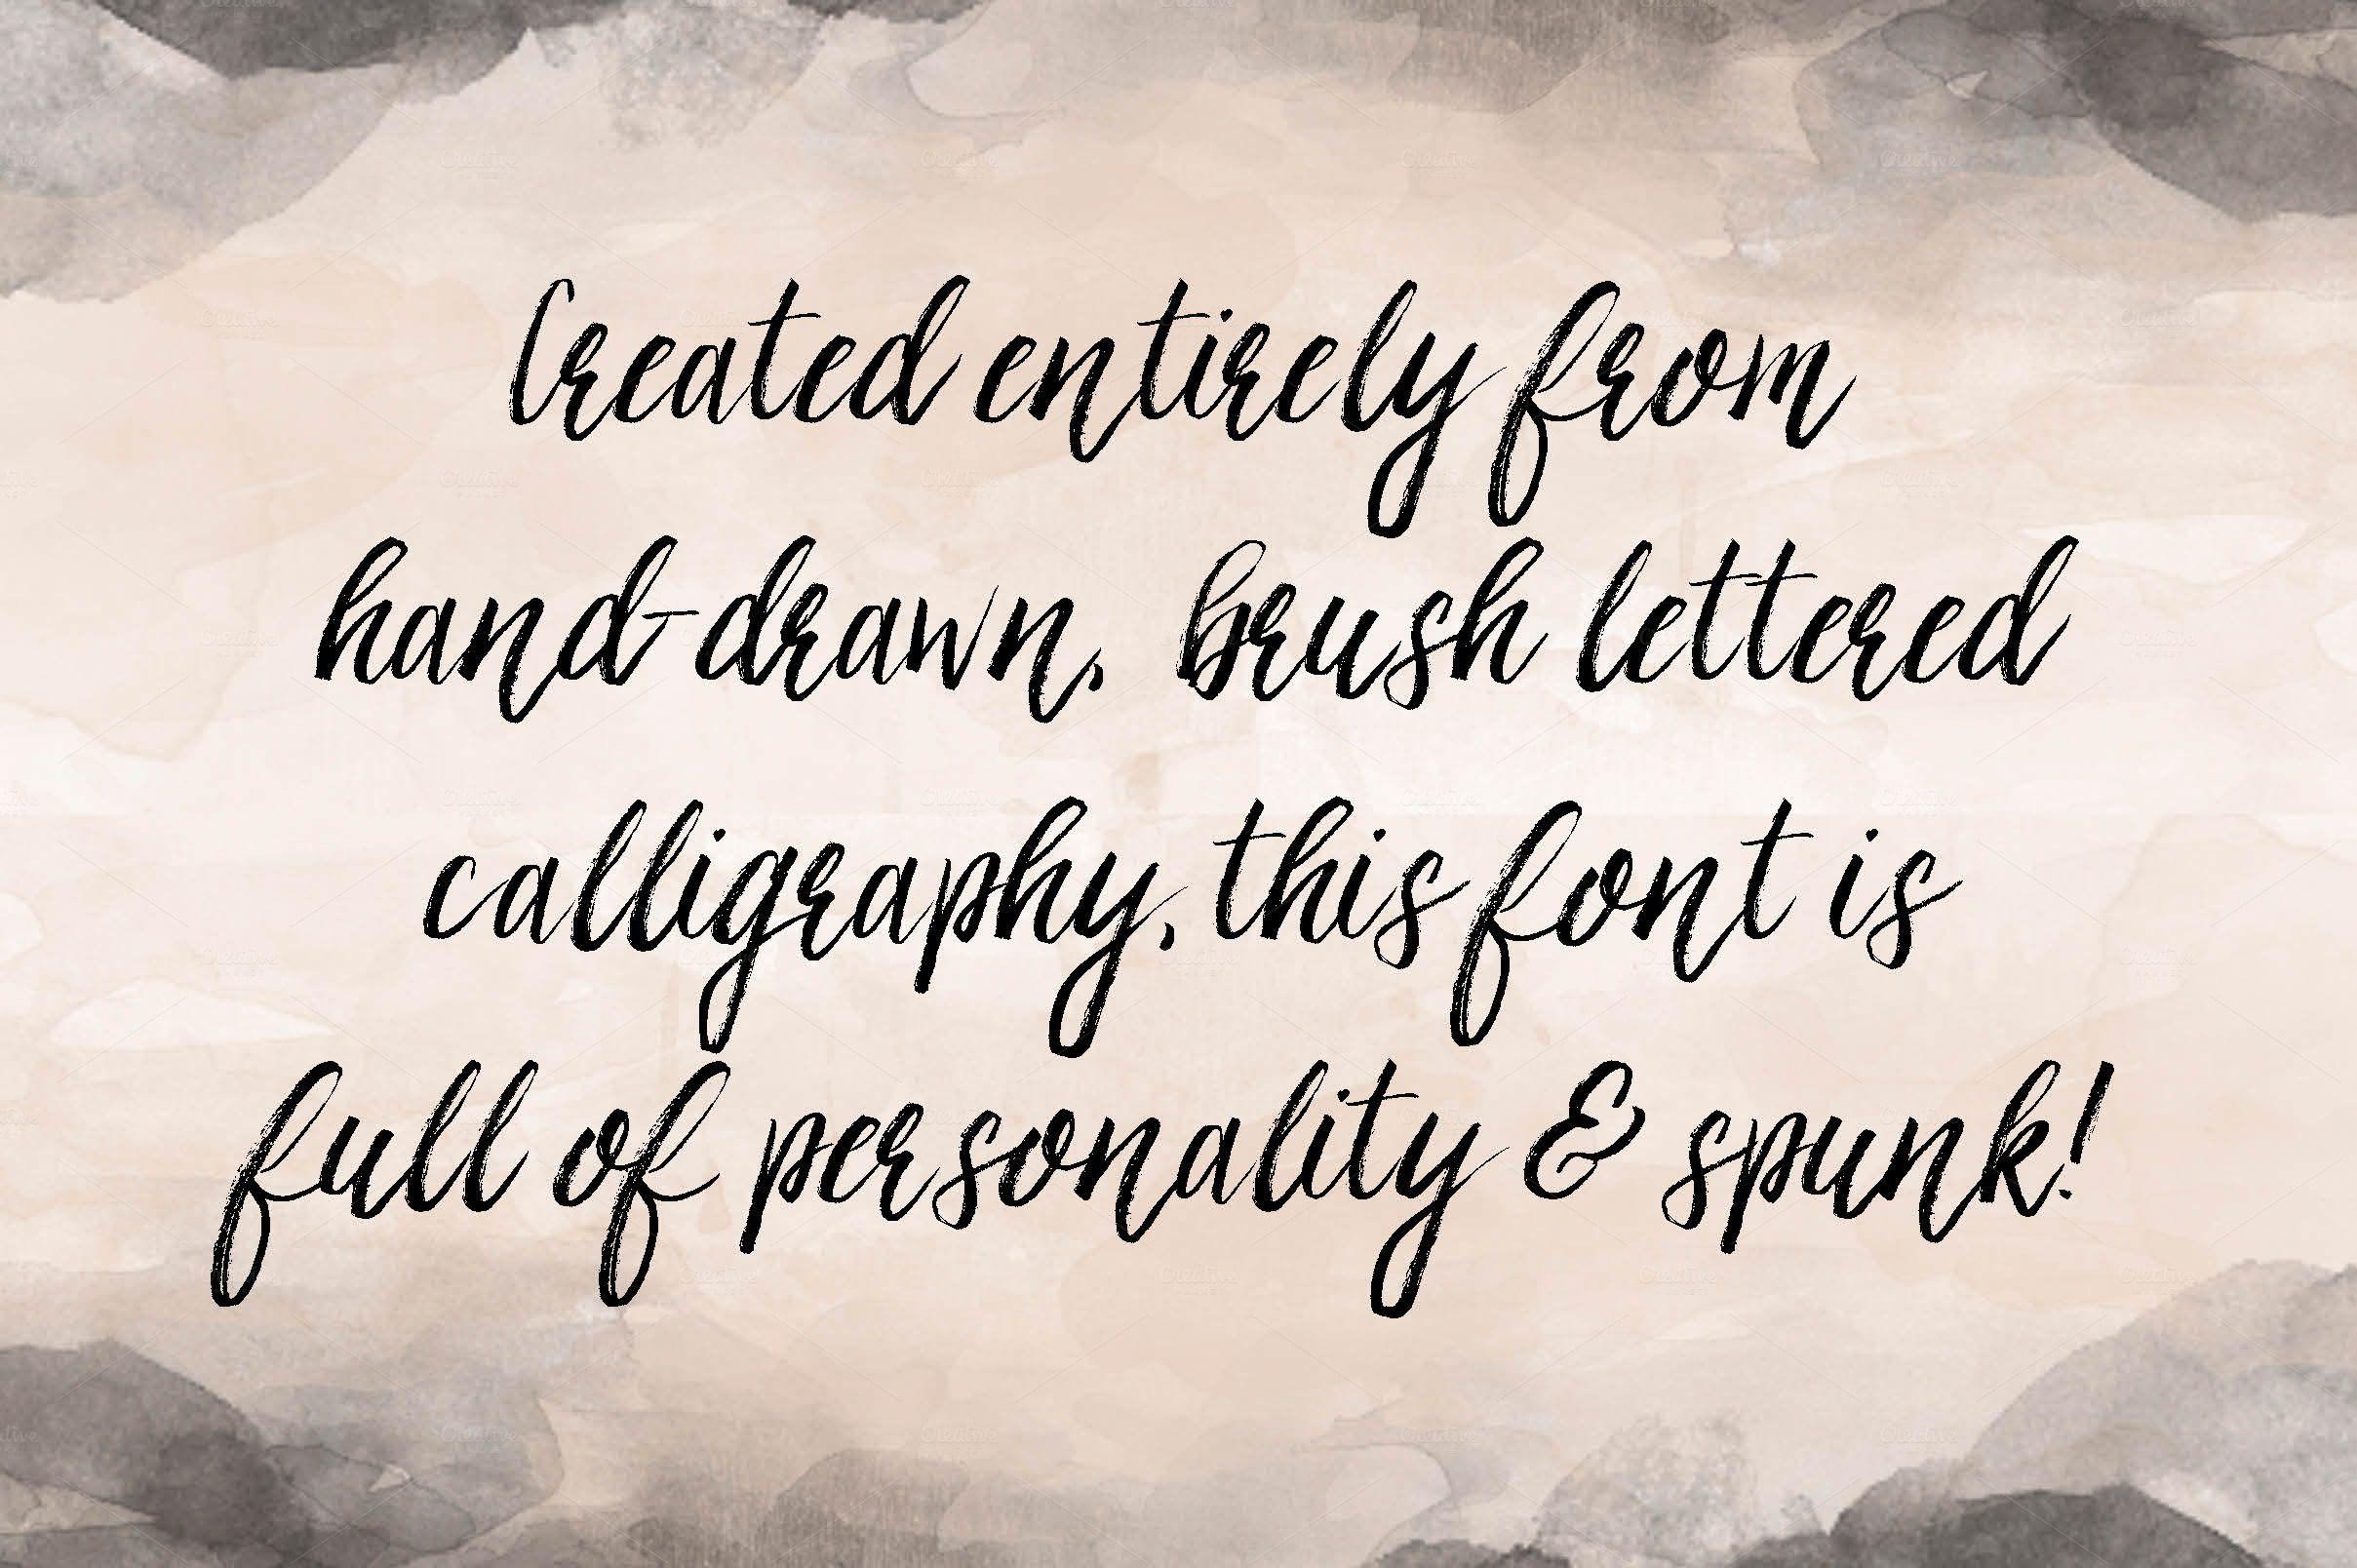 Ashley brush script by printable wisdom on @creativemarket fun